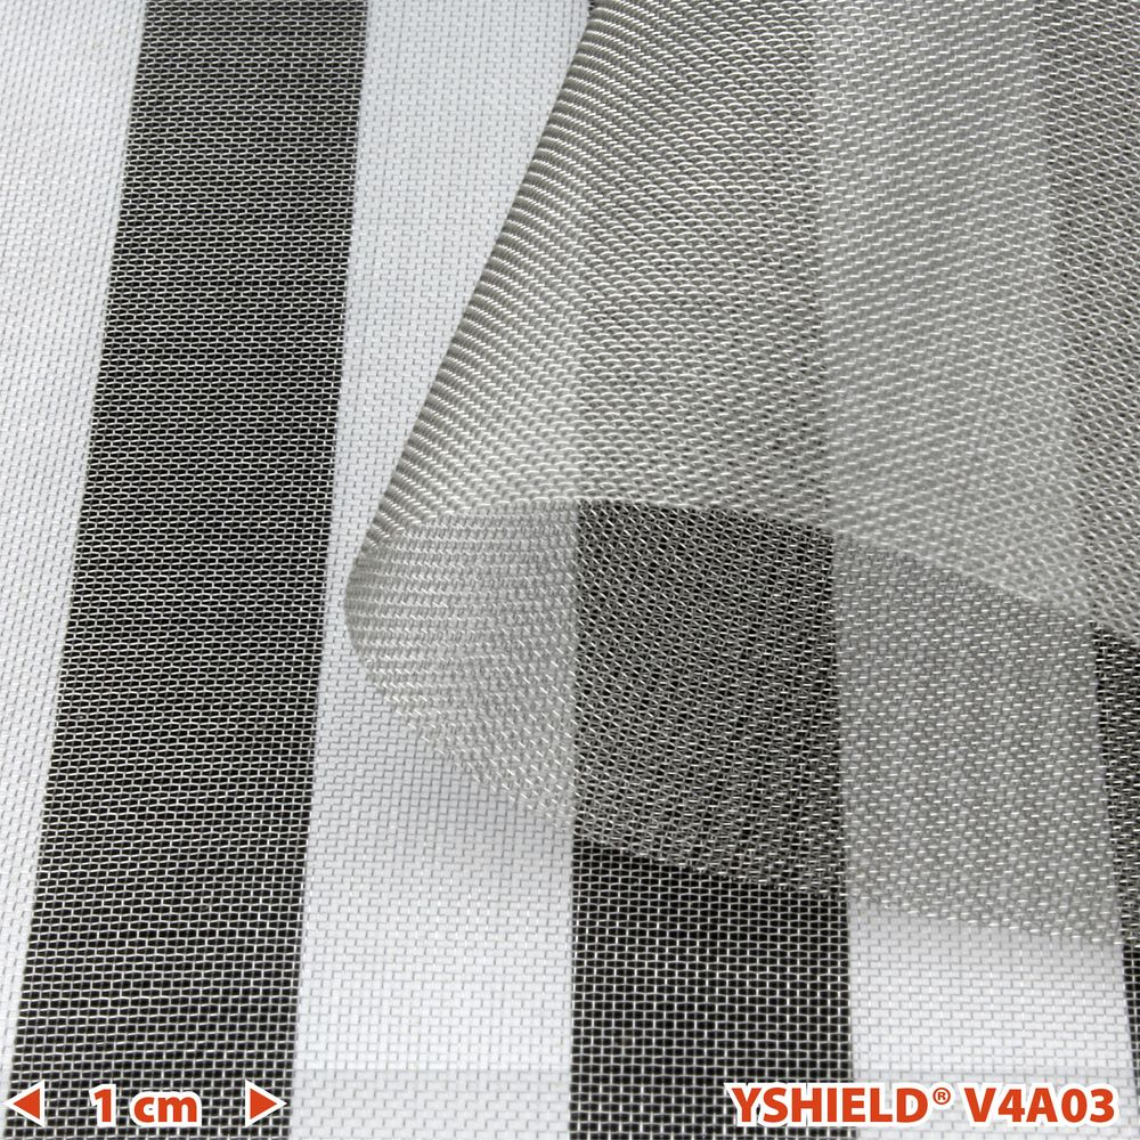 YSHIELD® V4A03 | Stainless steel mesh | Width 90 cm | 1 meter